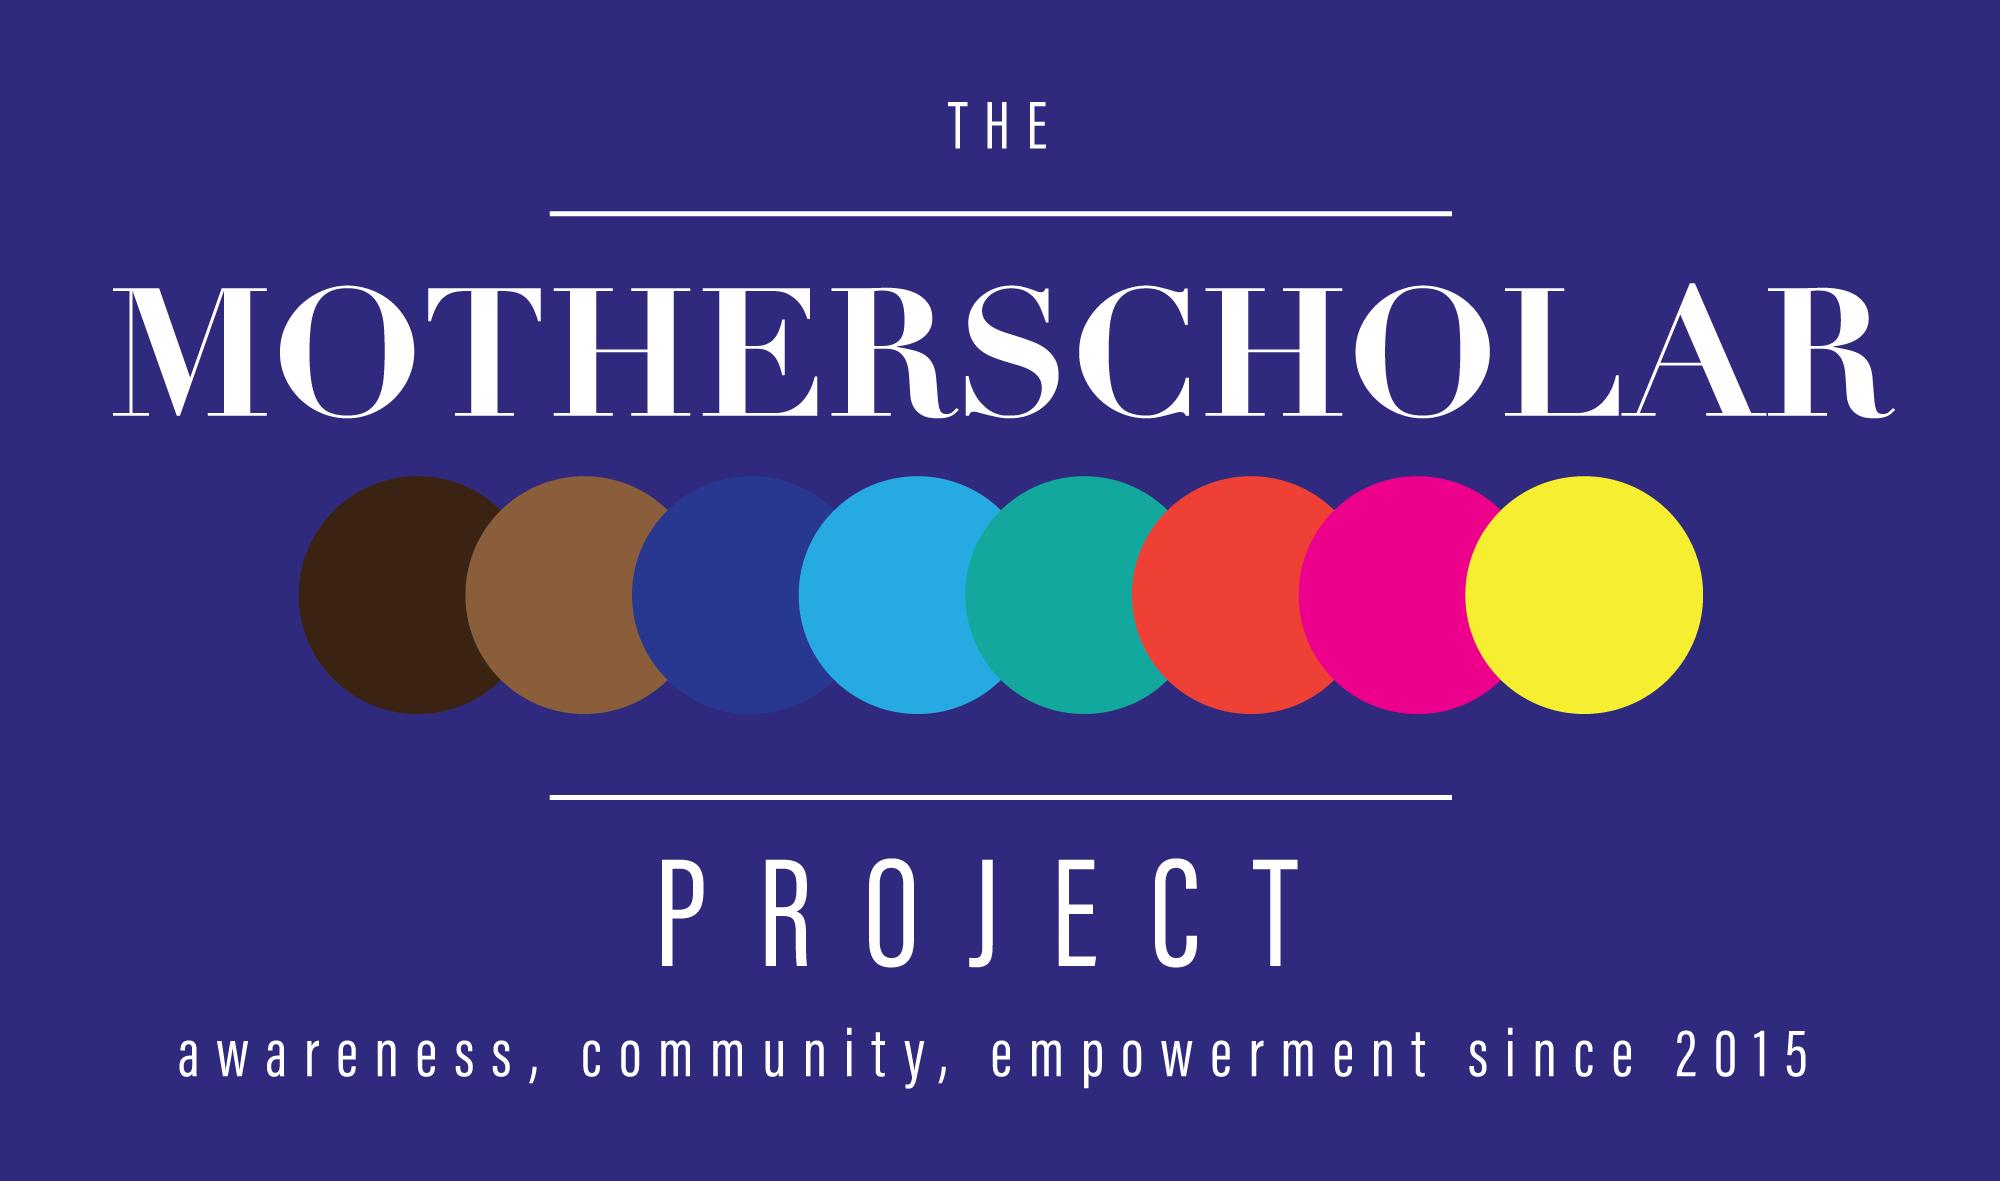 the motherscholar project